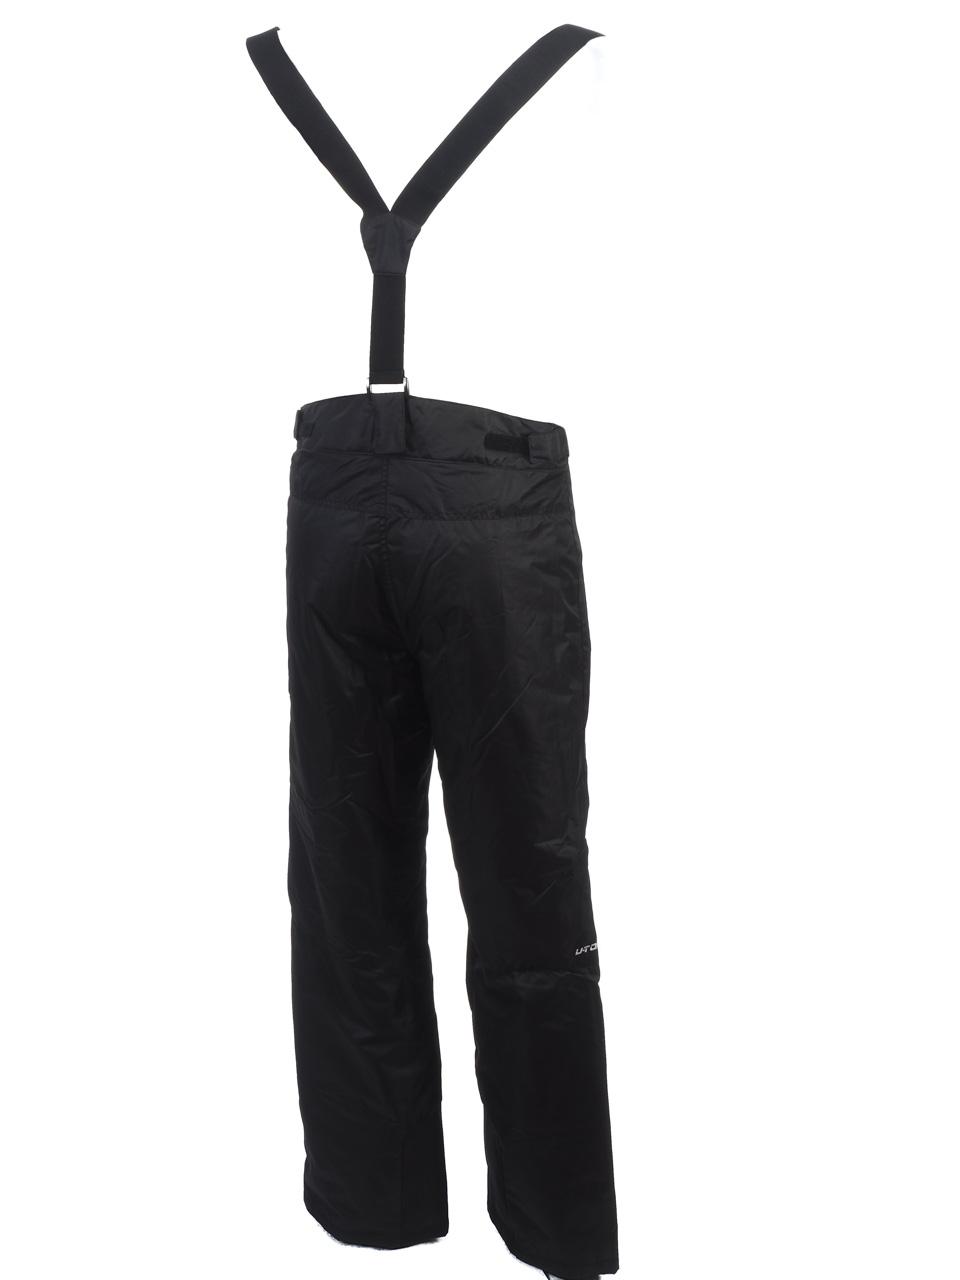 Pantalon-de-ski-surf-U-topik-Ringo-noir-pant-ski-Noir-87694-Neuf